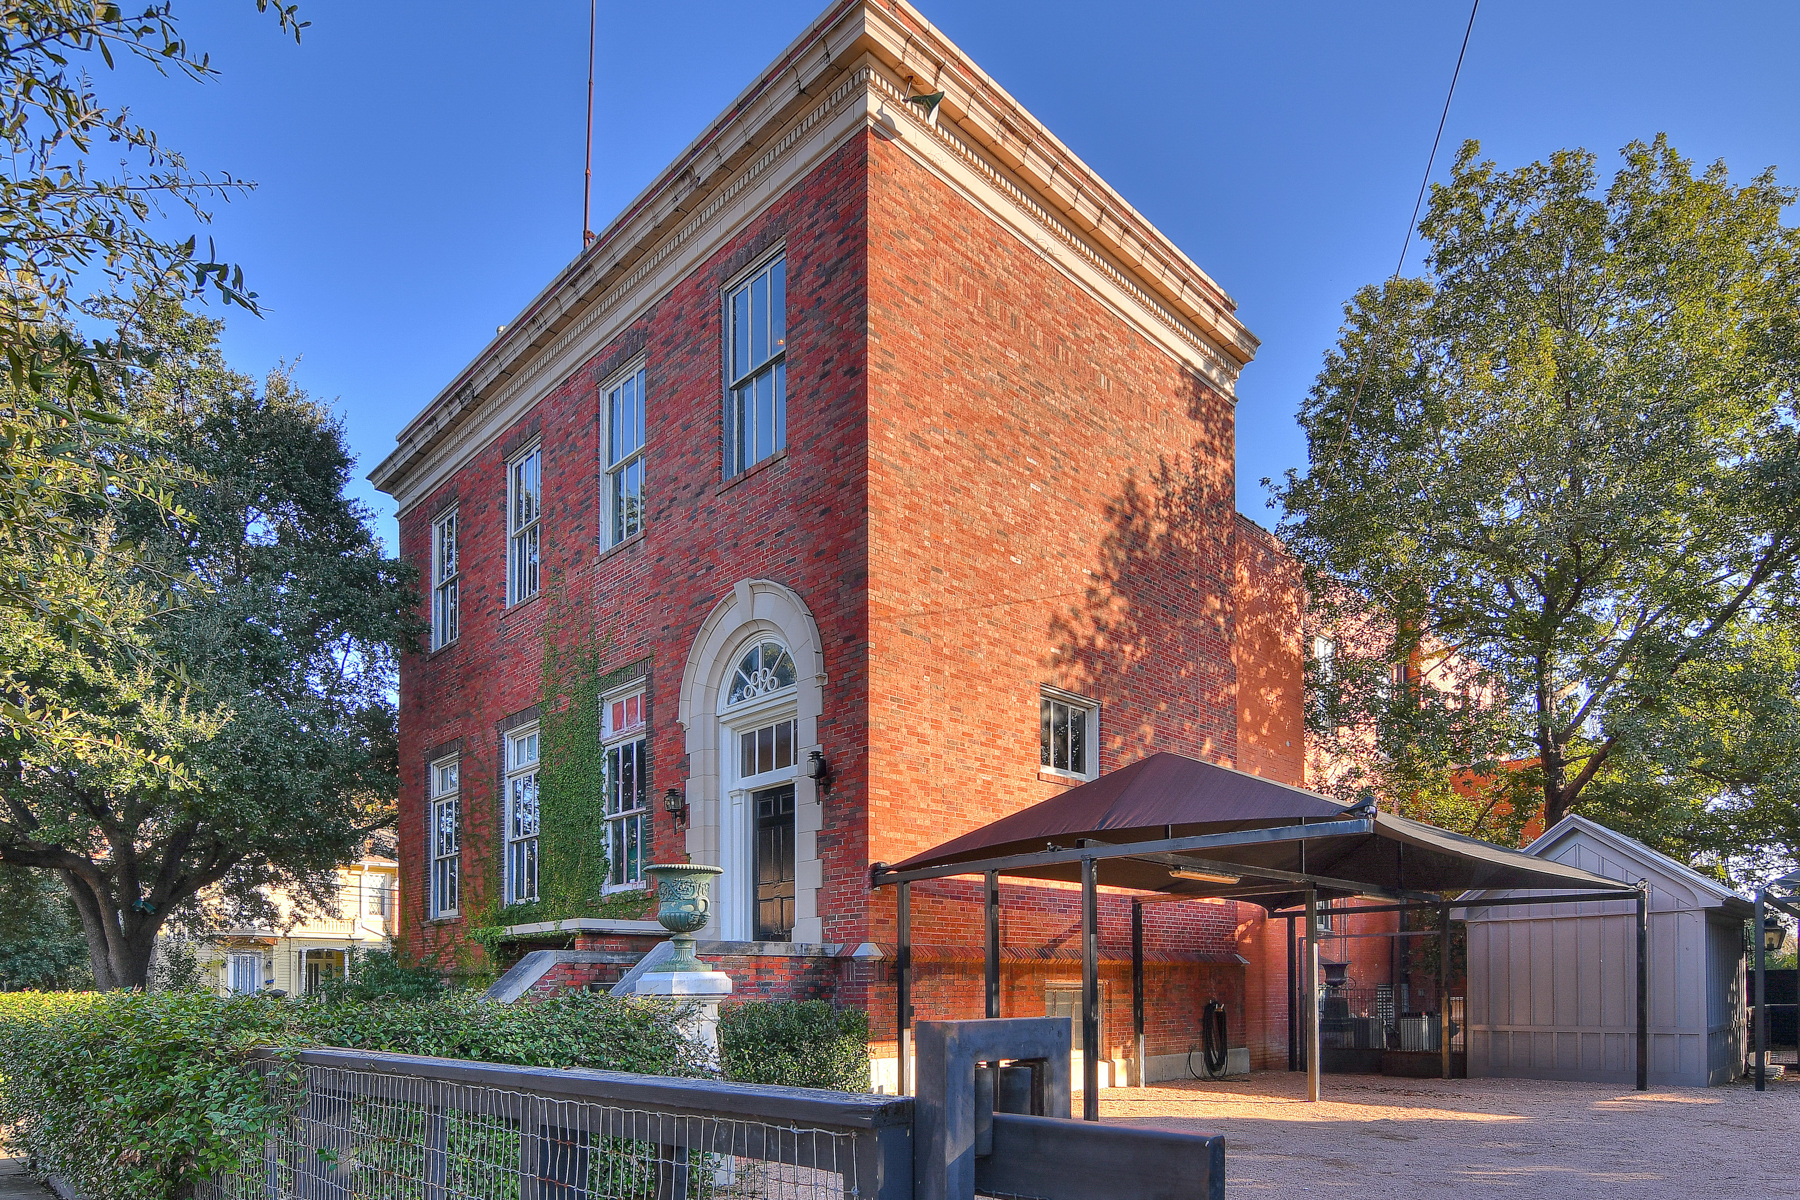 Casa para uma família para Venda às Historic Bellhouse Building in Alta Vista 502 W Mistletoe Ave Alta Vista, San Antonio, Texas, 78212 Estados Unidos